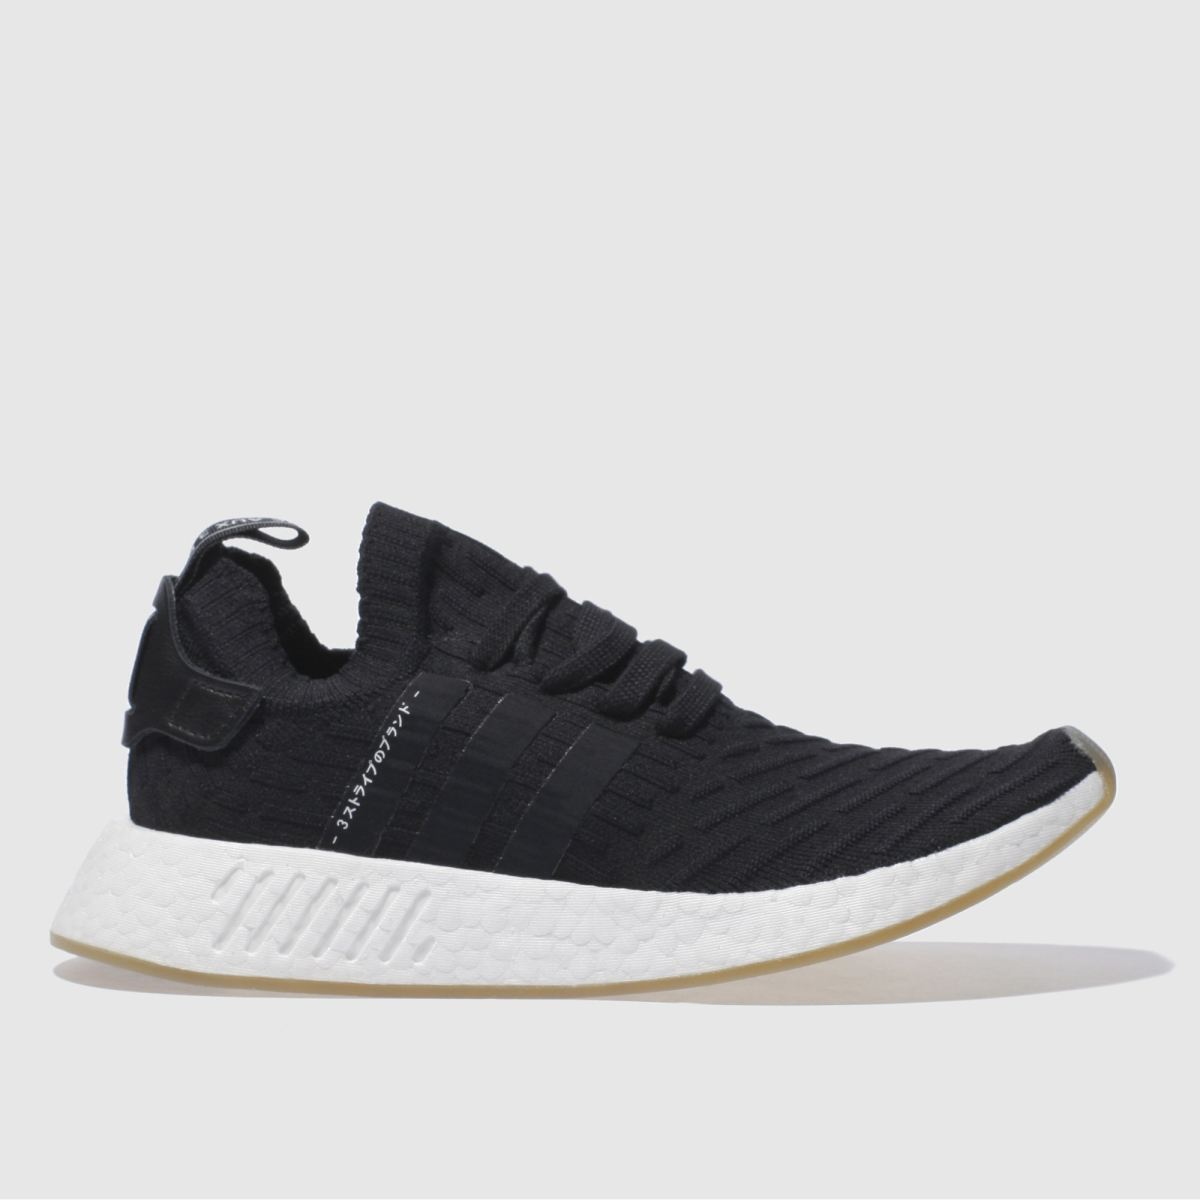 adidas black & white nmd_r2 primeknit trainers